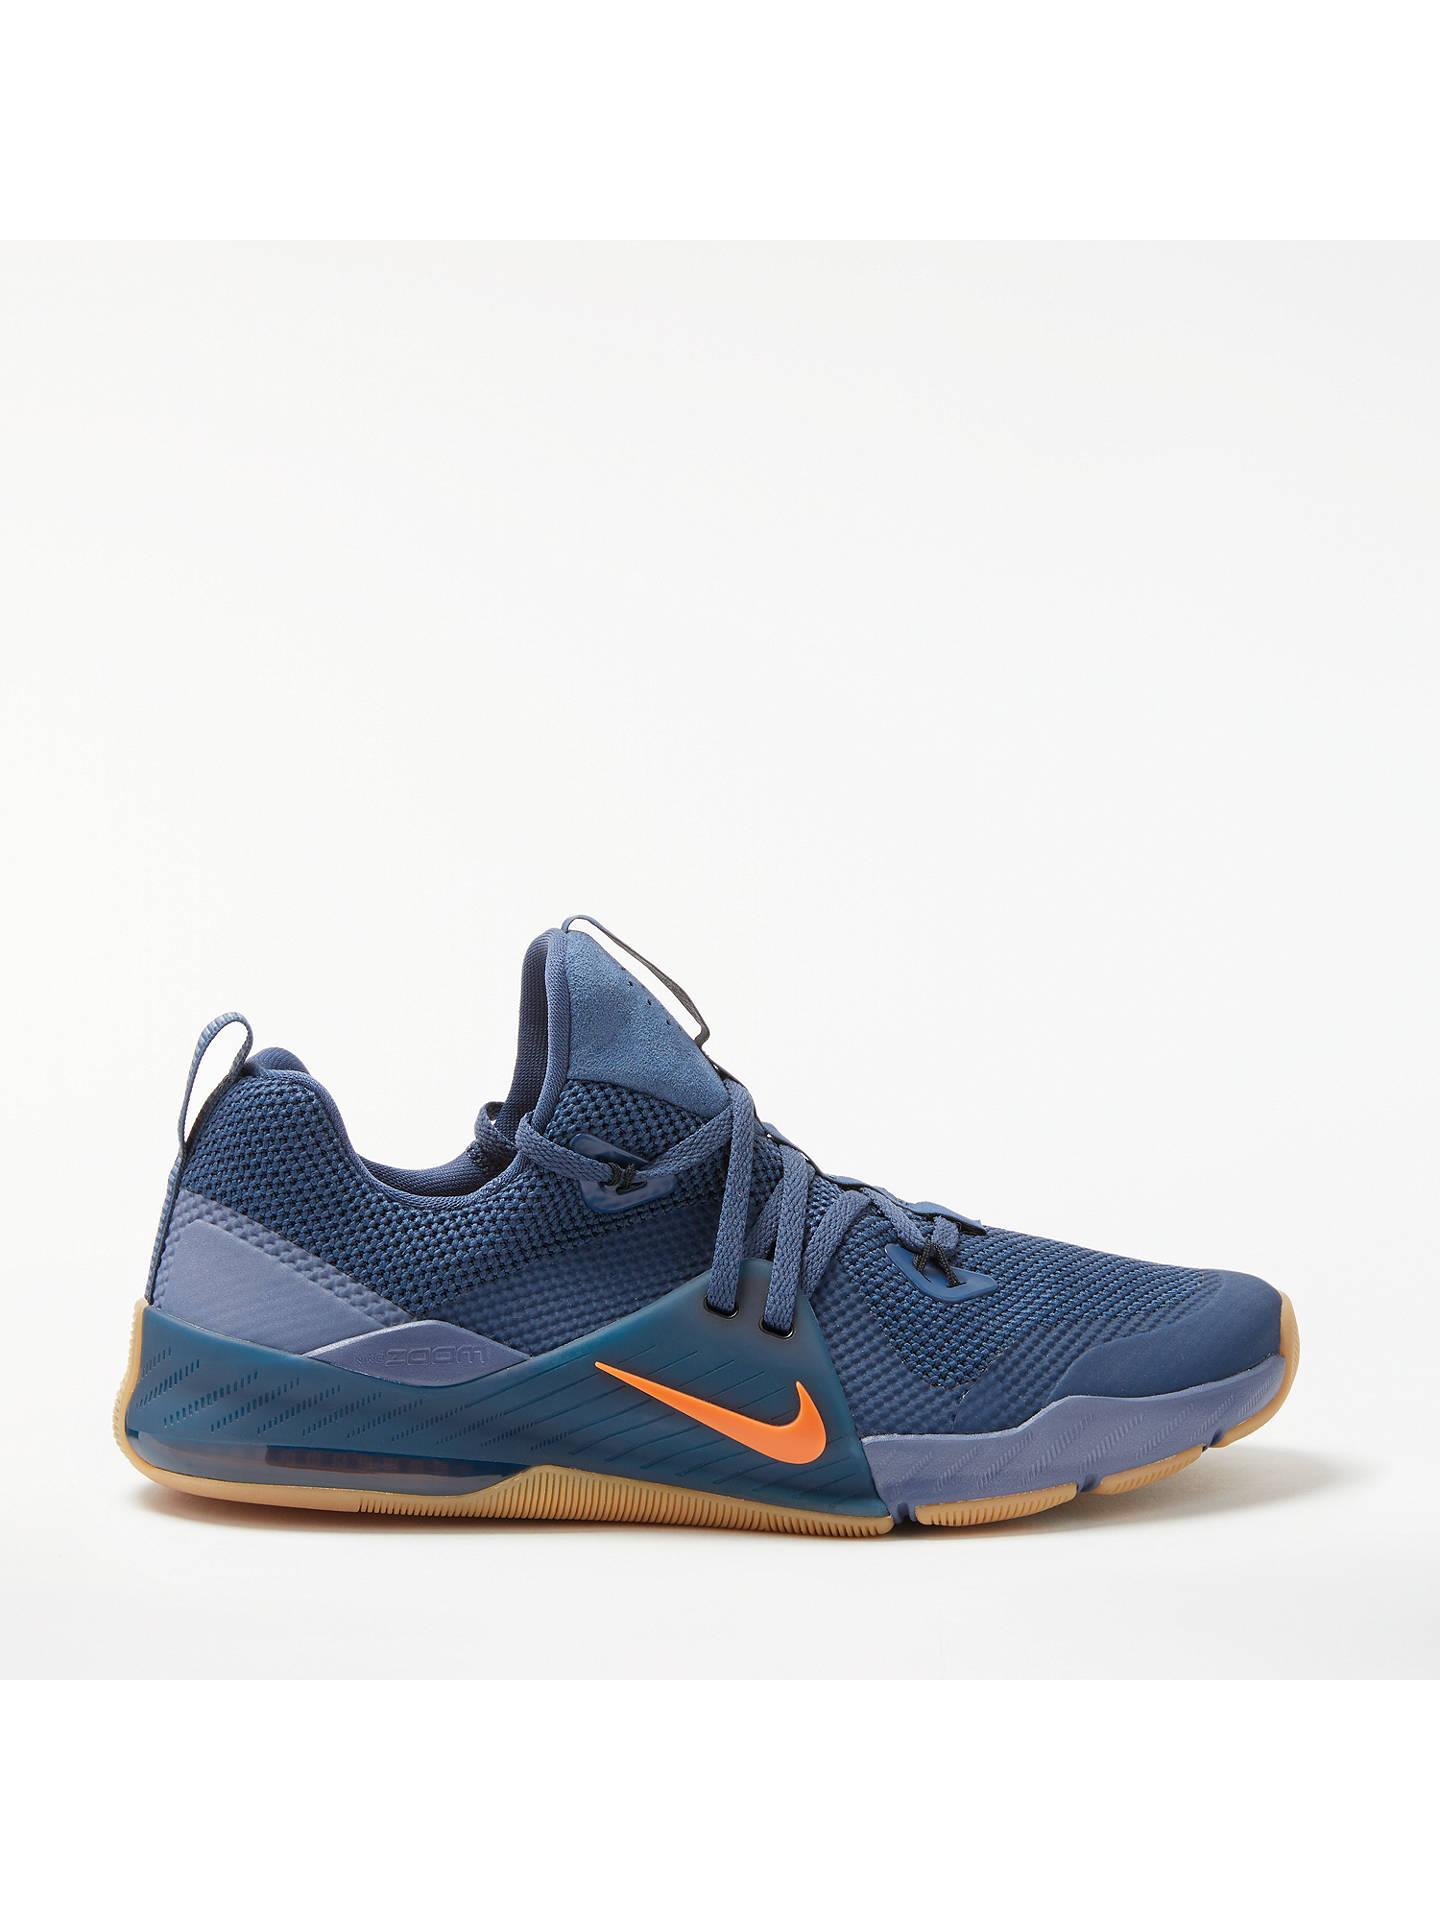 b2a3c591d79ab Buy Nike Zoom Command Men s Training Shoes